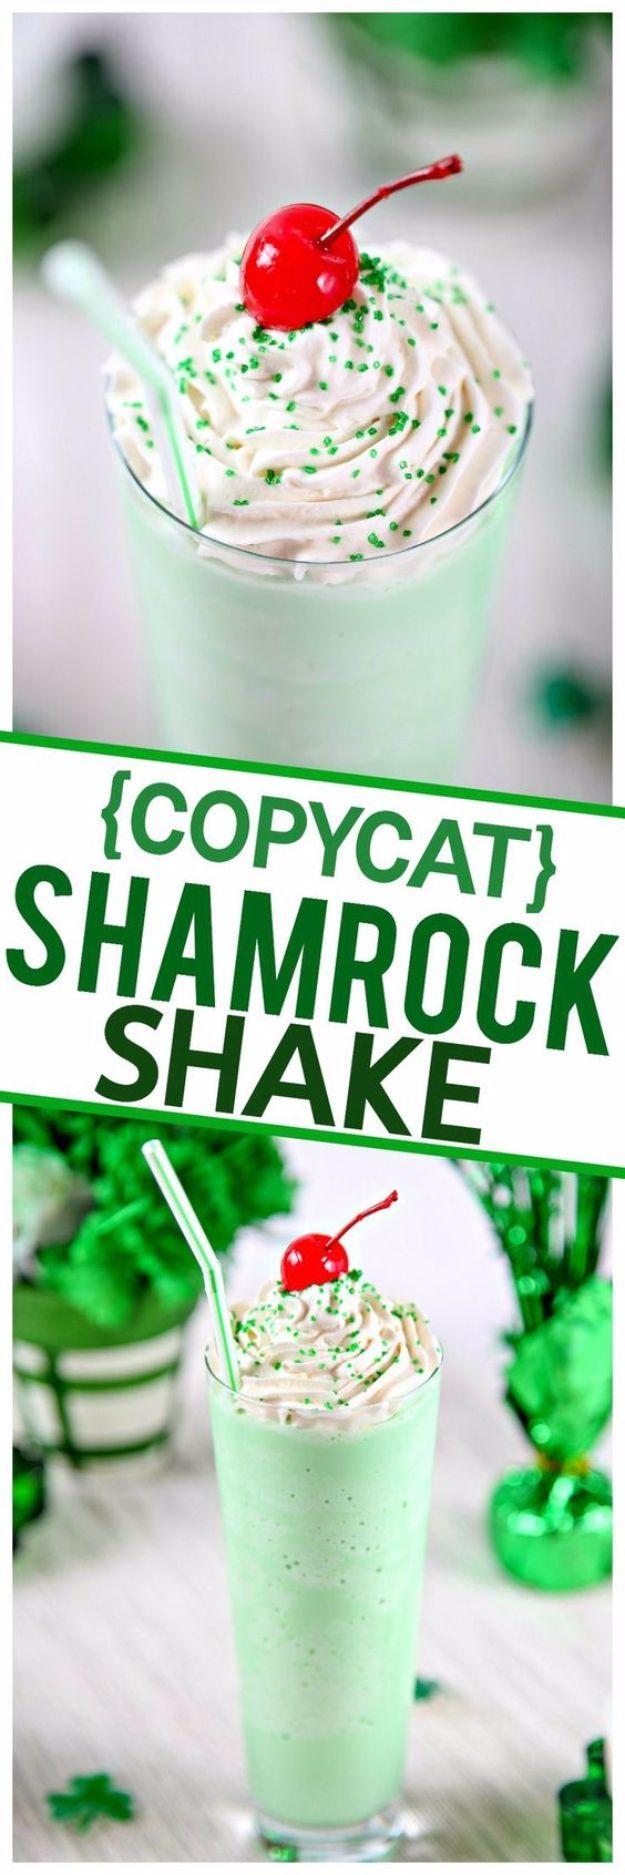 50 More Best Copycat Recipes From Top Restaurants - Homemade Shamrock Shake Recipe - Awesome Recipe Knockoffs and Recipe Ideas from Chipotle Restaurant, Starbucks, Olive Garden, Cinabbon, Cracker Barrel, Taco Bell, Cheesecake Factory, KFC, Mc Donalds, Red Lobster, Panda Express http://diyjoy.com/best-copycat-restaurant-recipes